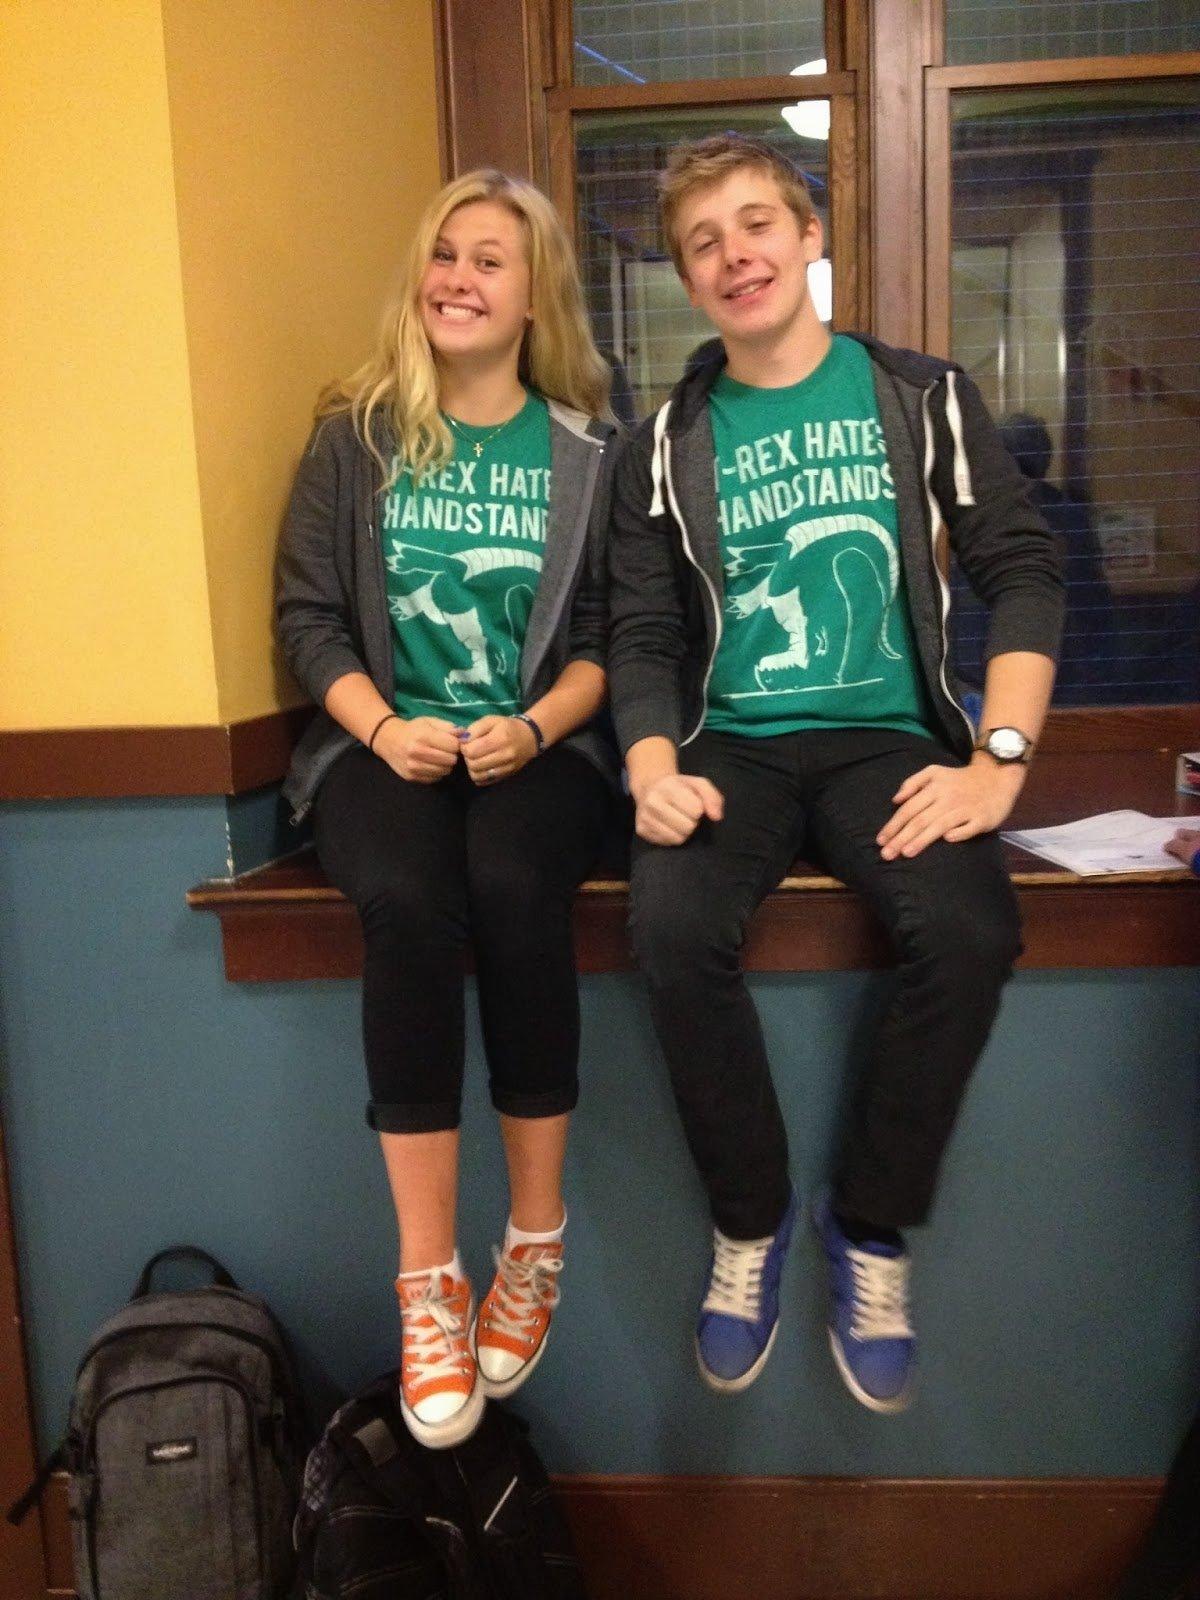 10 Pretty Cute Ideas For Twin Day At School cute twin day ideas for school s rk